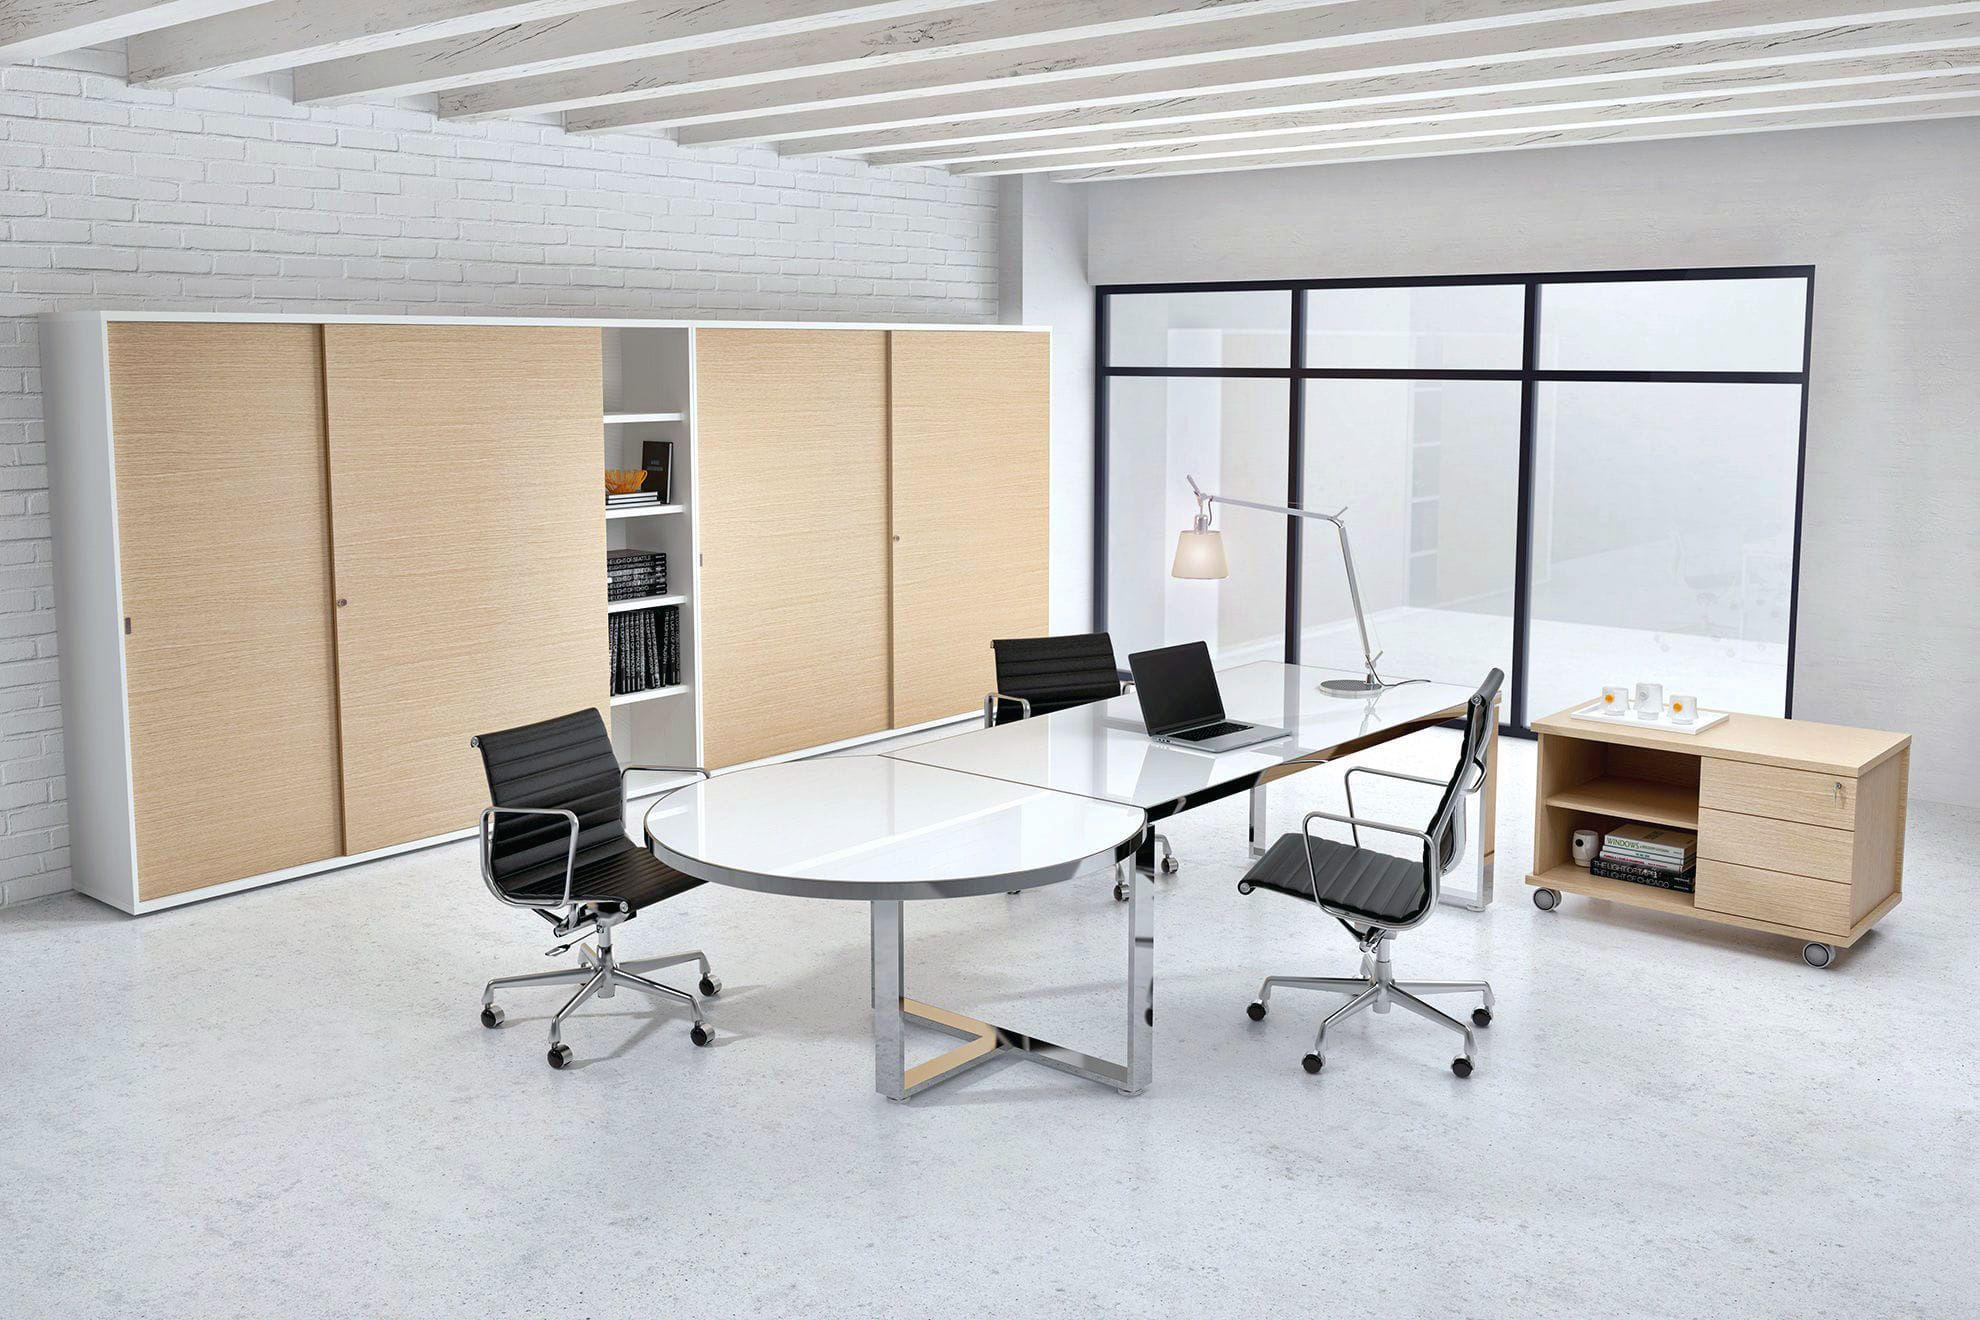 Chrome White Modern Glass Desk Shown With Matching Contemporary Storage Modern Glass Desk Glass Desk Contemporary Desk